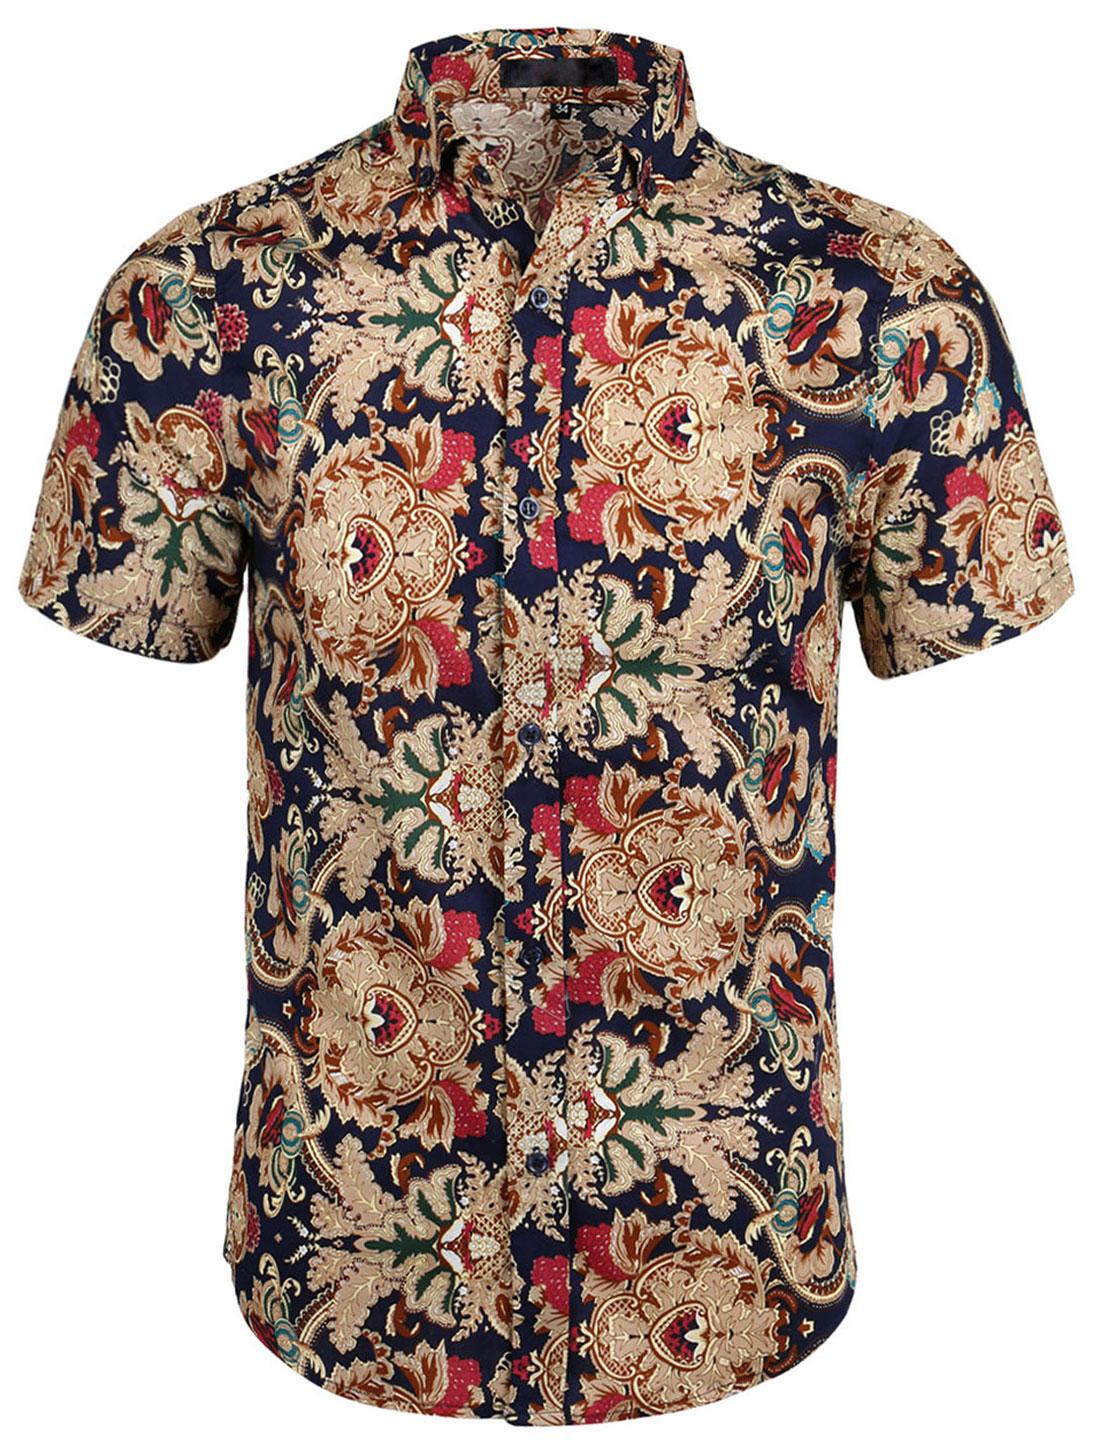 Men Short Sleeve Button Down Vintage Flower Pattern Casual Shirt Camel M